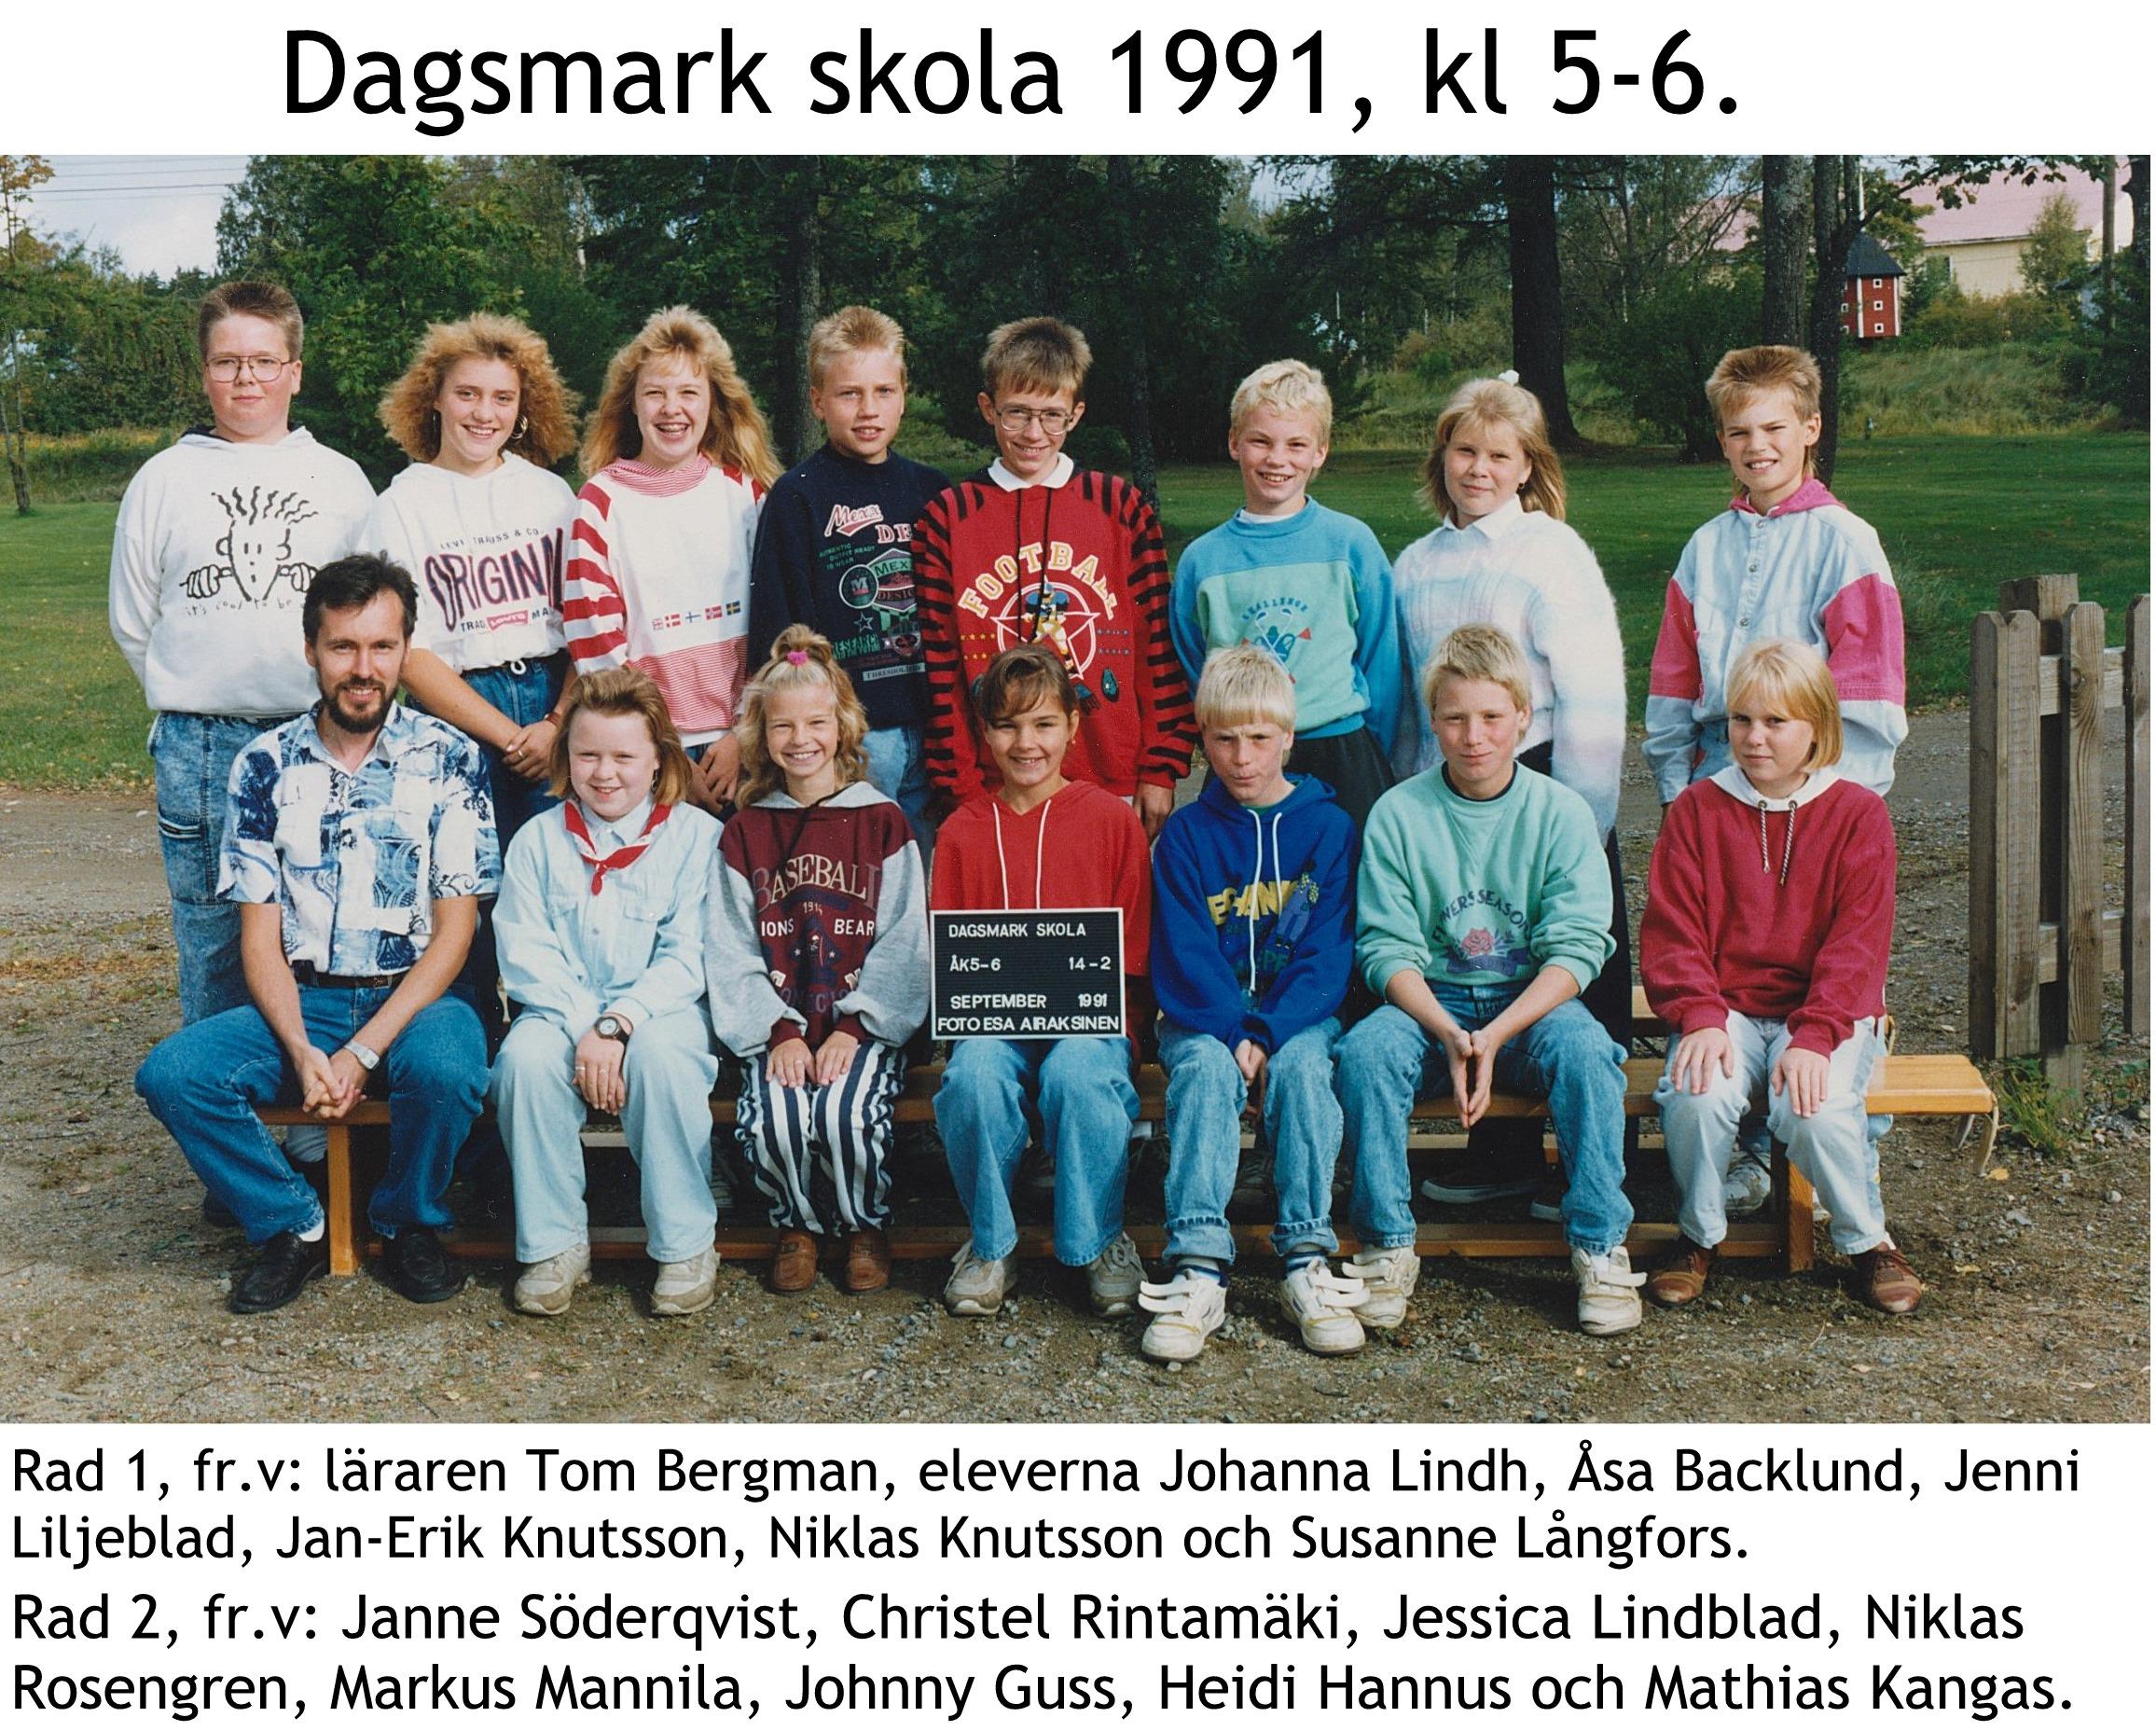 1991 Dagsmark skola kl 5-6